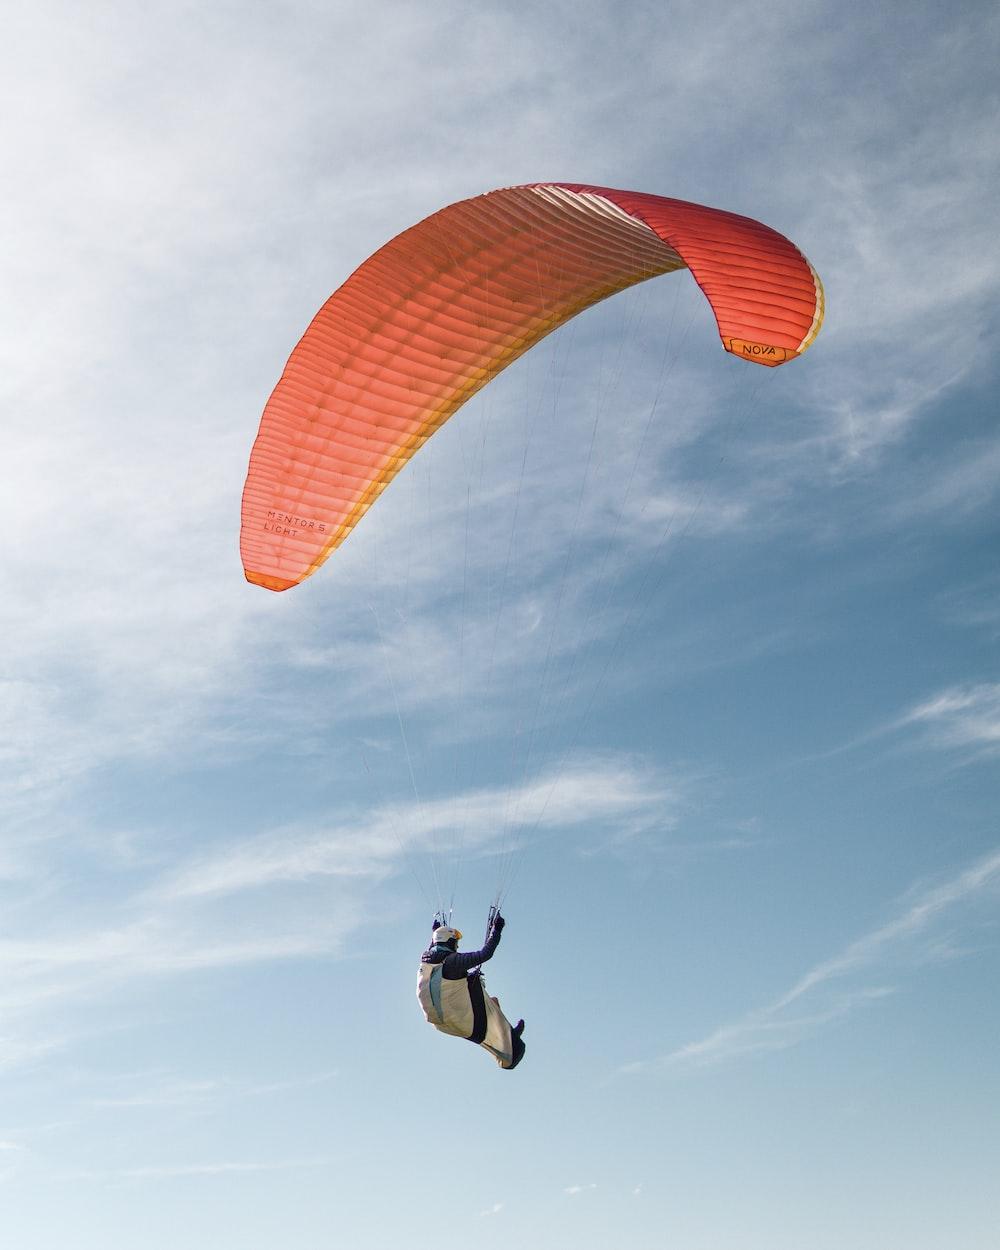 person in orange parachute under blue sky during daytime